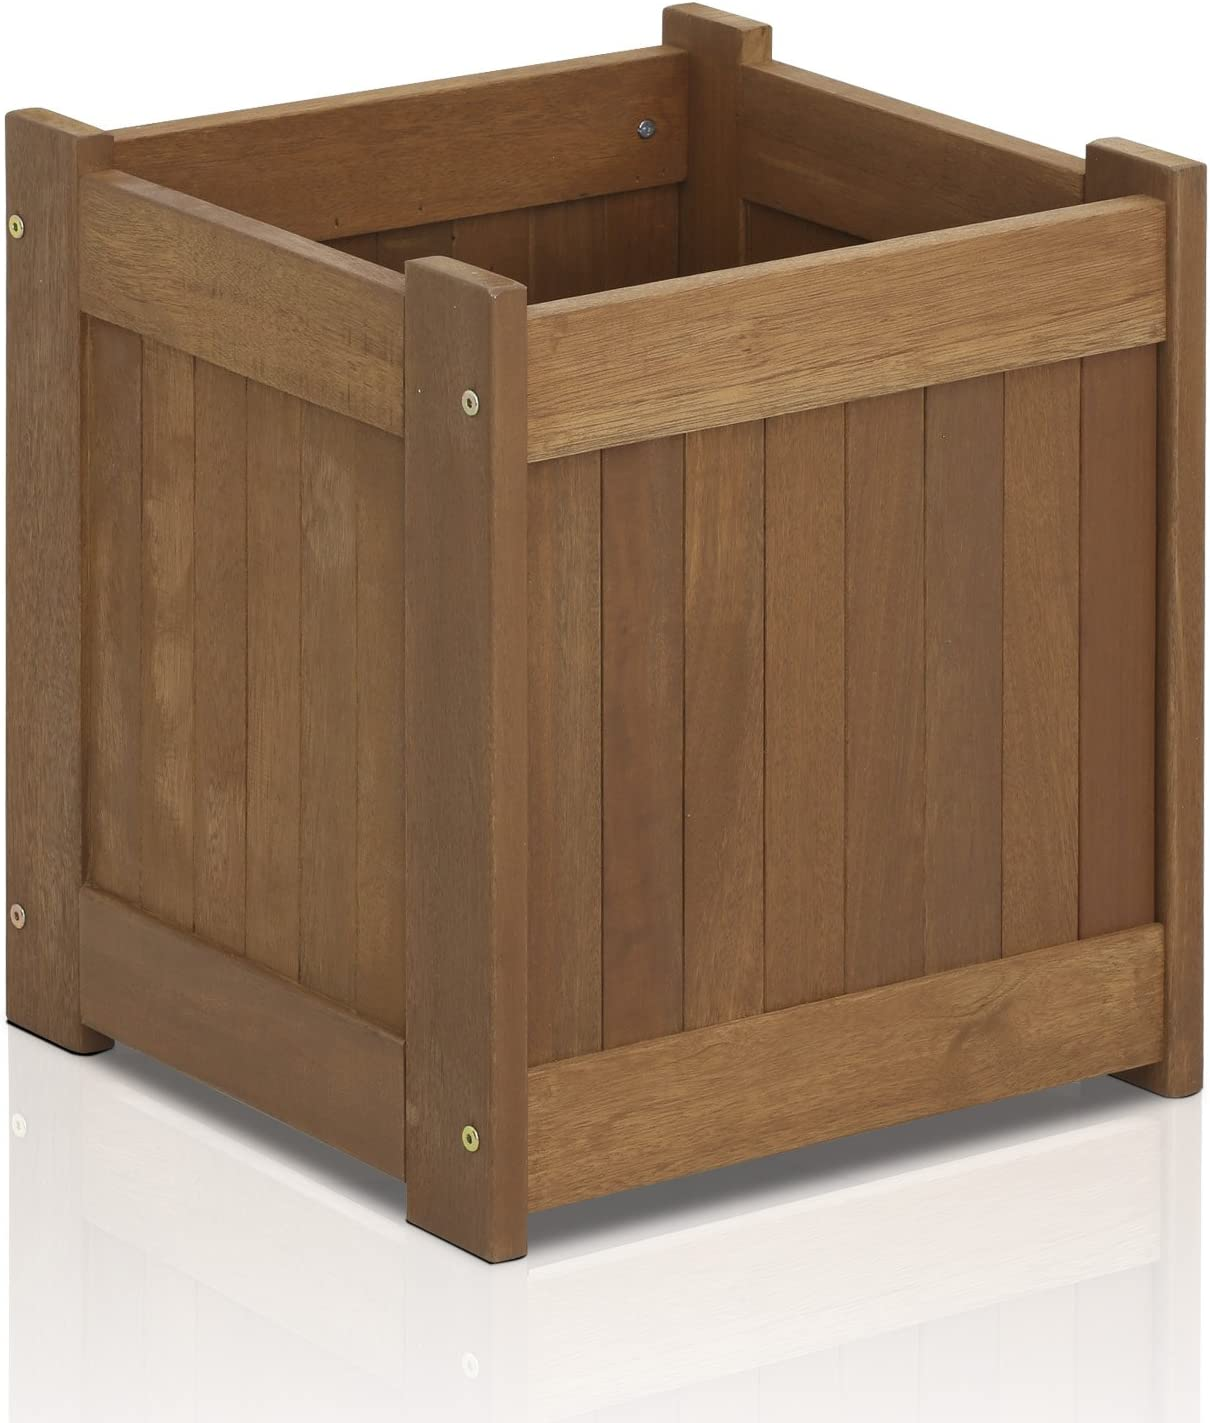 Furinno FG16450 Tioman Hardwood Flower Box, One-Pack, Natural